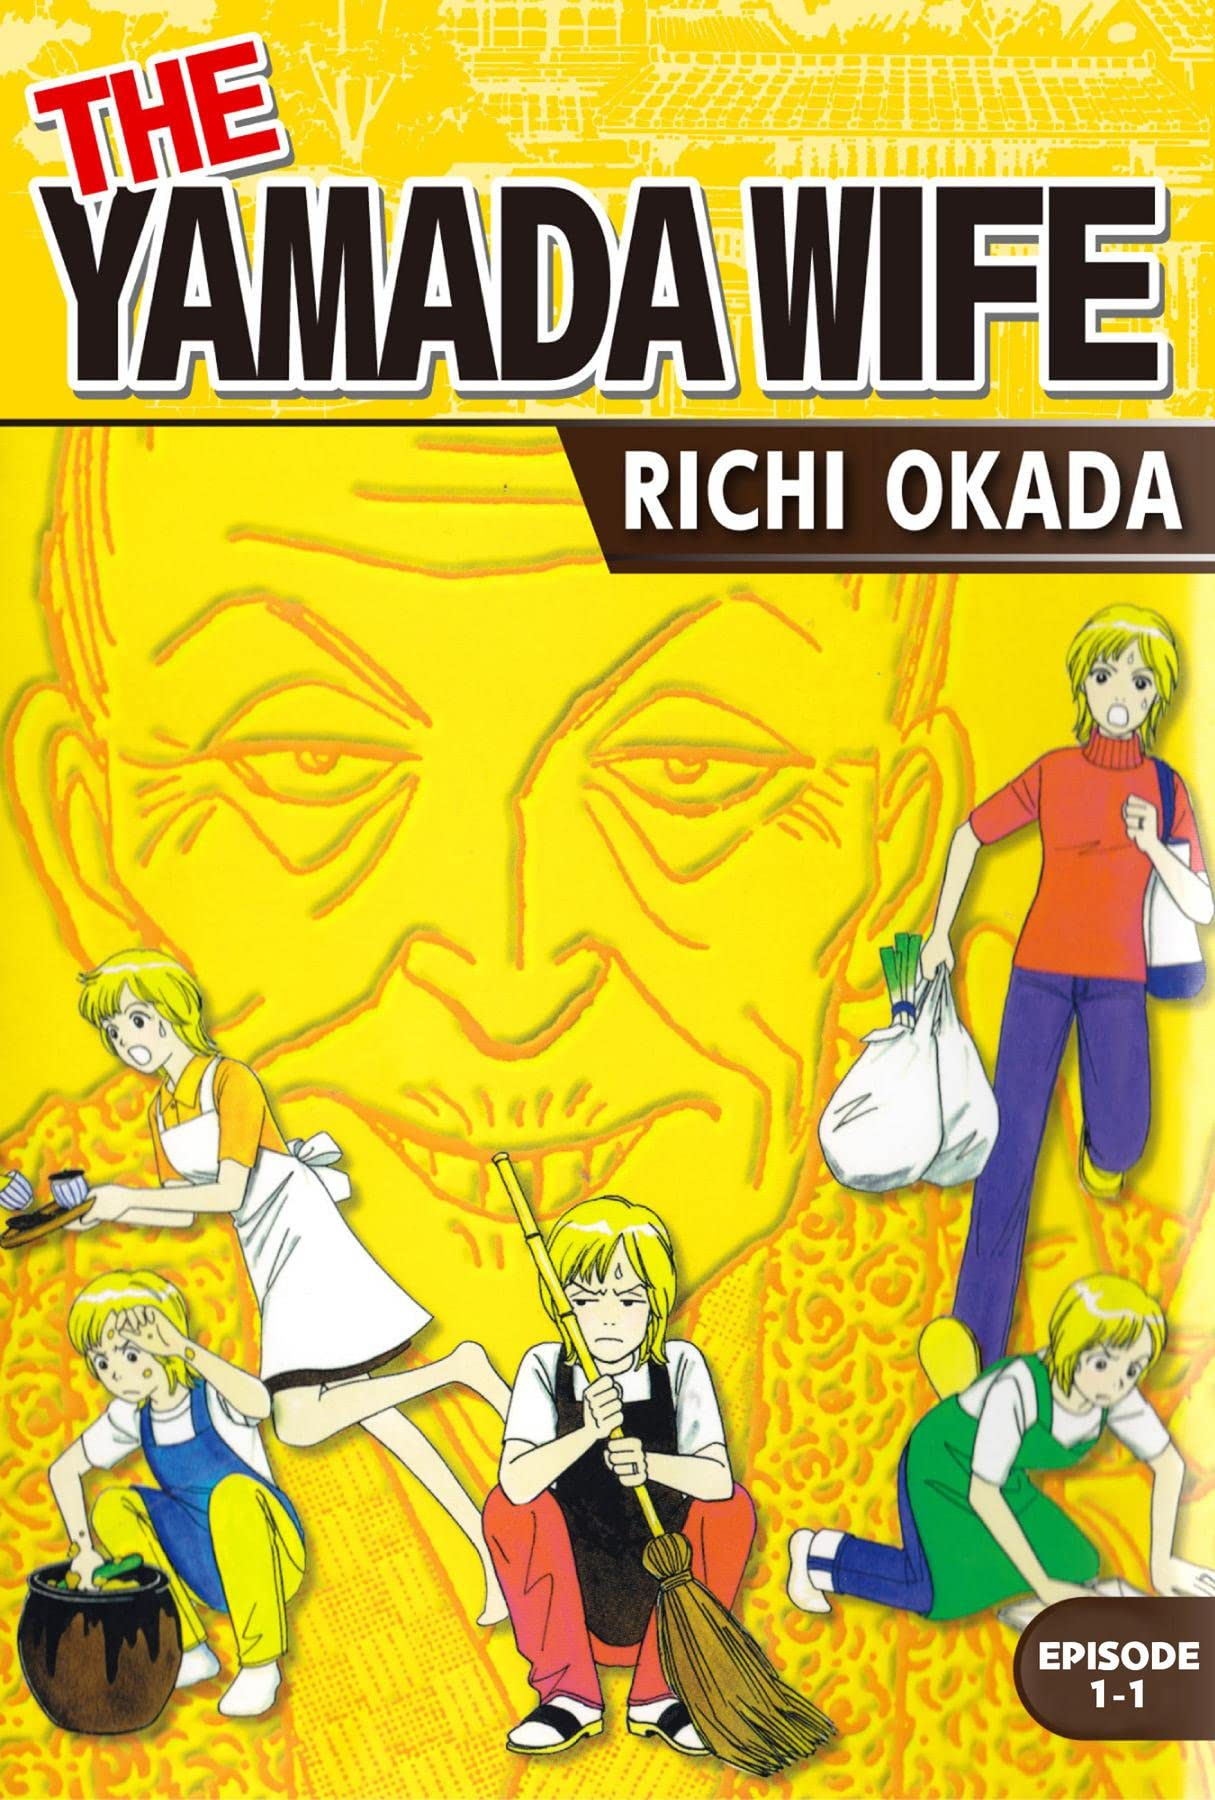 THE YAMADA WIFE #1